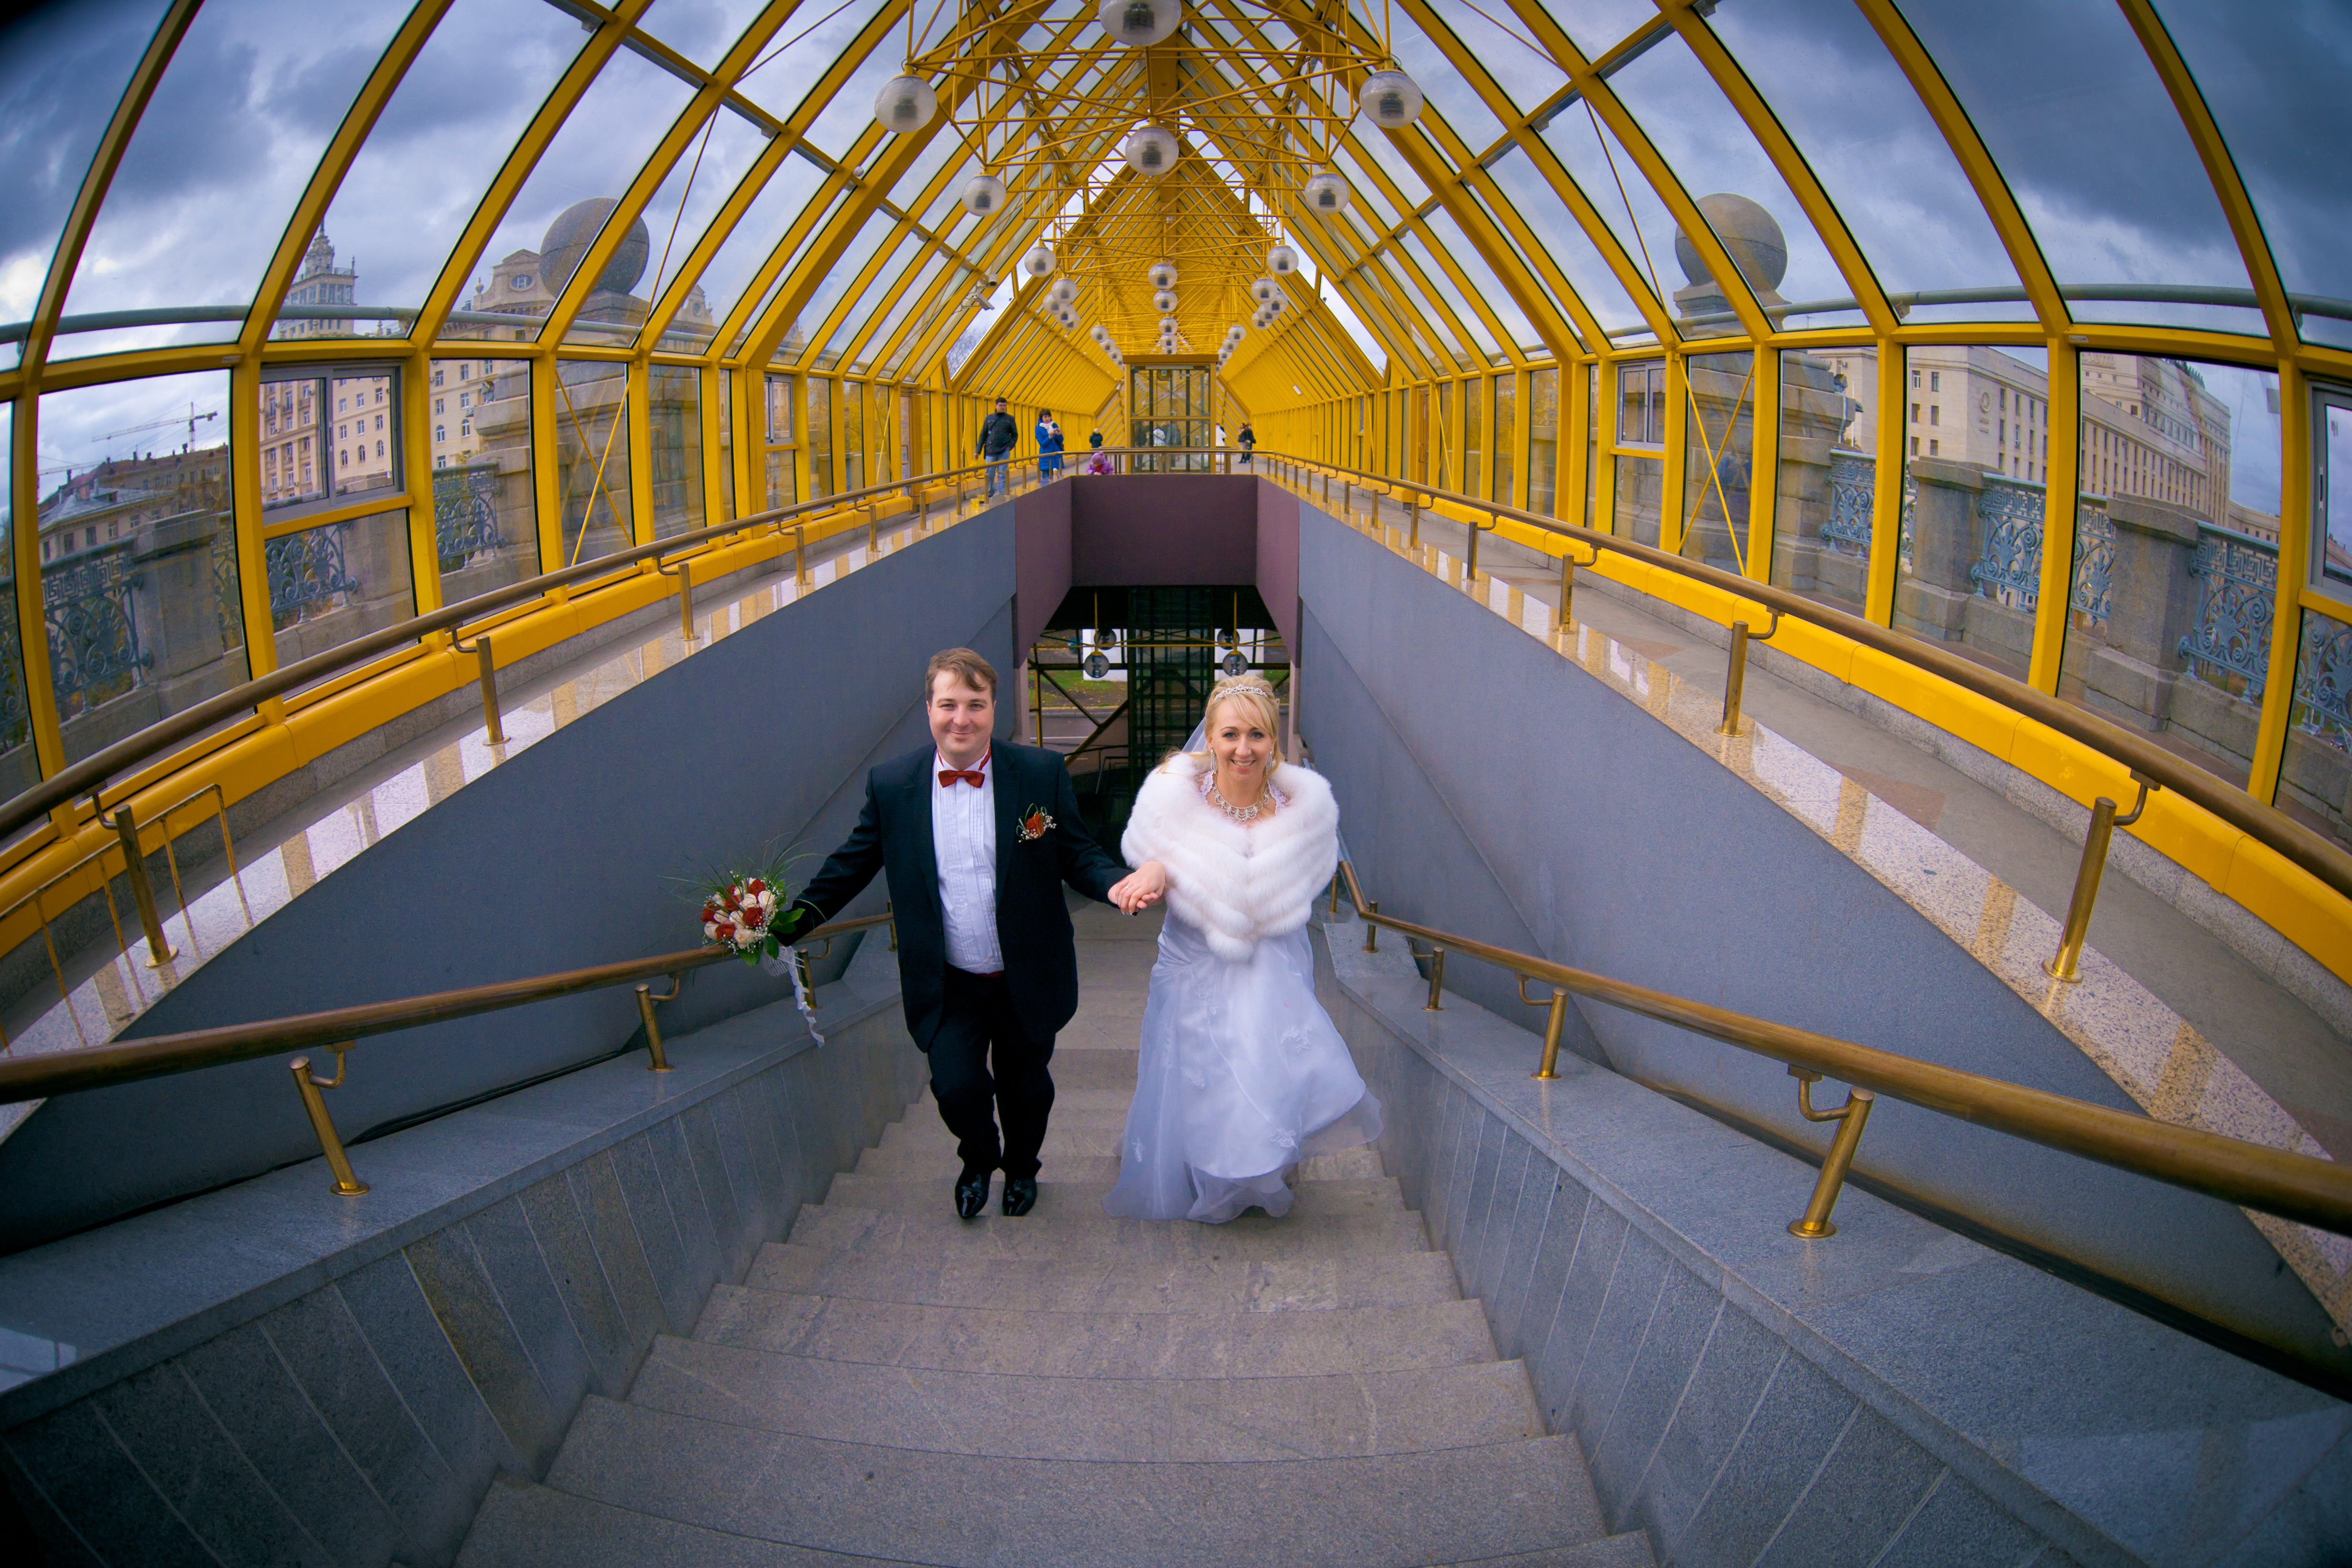 Шубки накидки свадебная накидка напрокат для свадьбы Москва Wedding fur